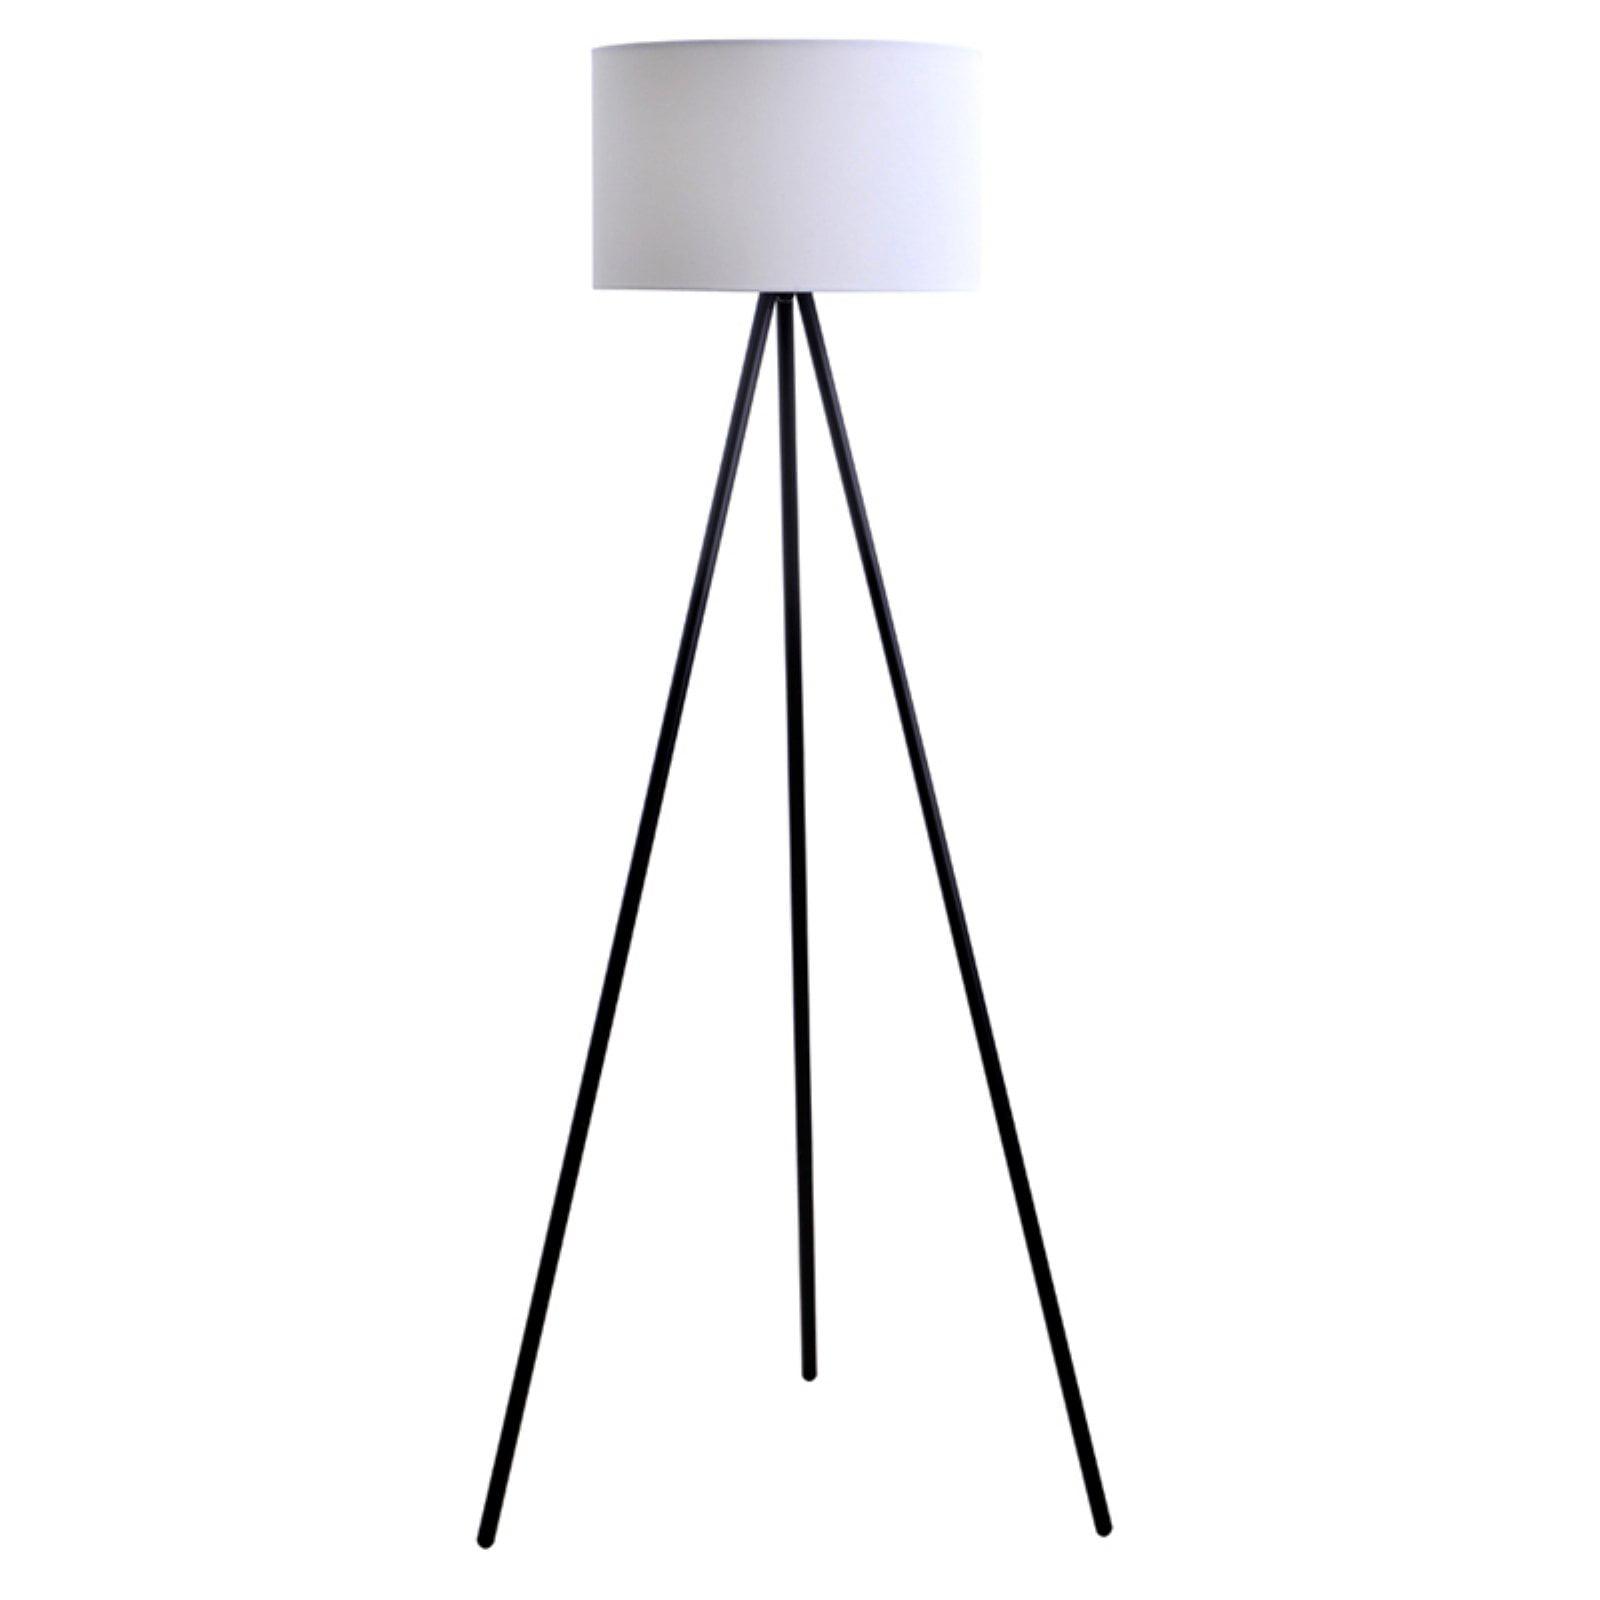 Catalina Lighting 3-Way Black Tripod Floor Lamp by Evolution Lighting LLC